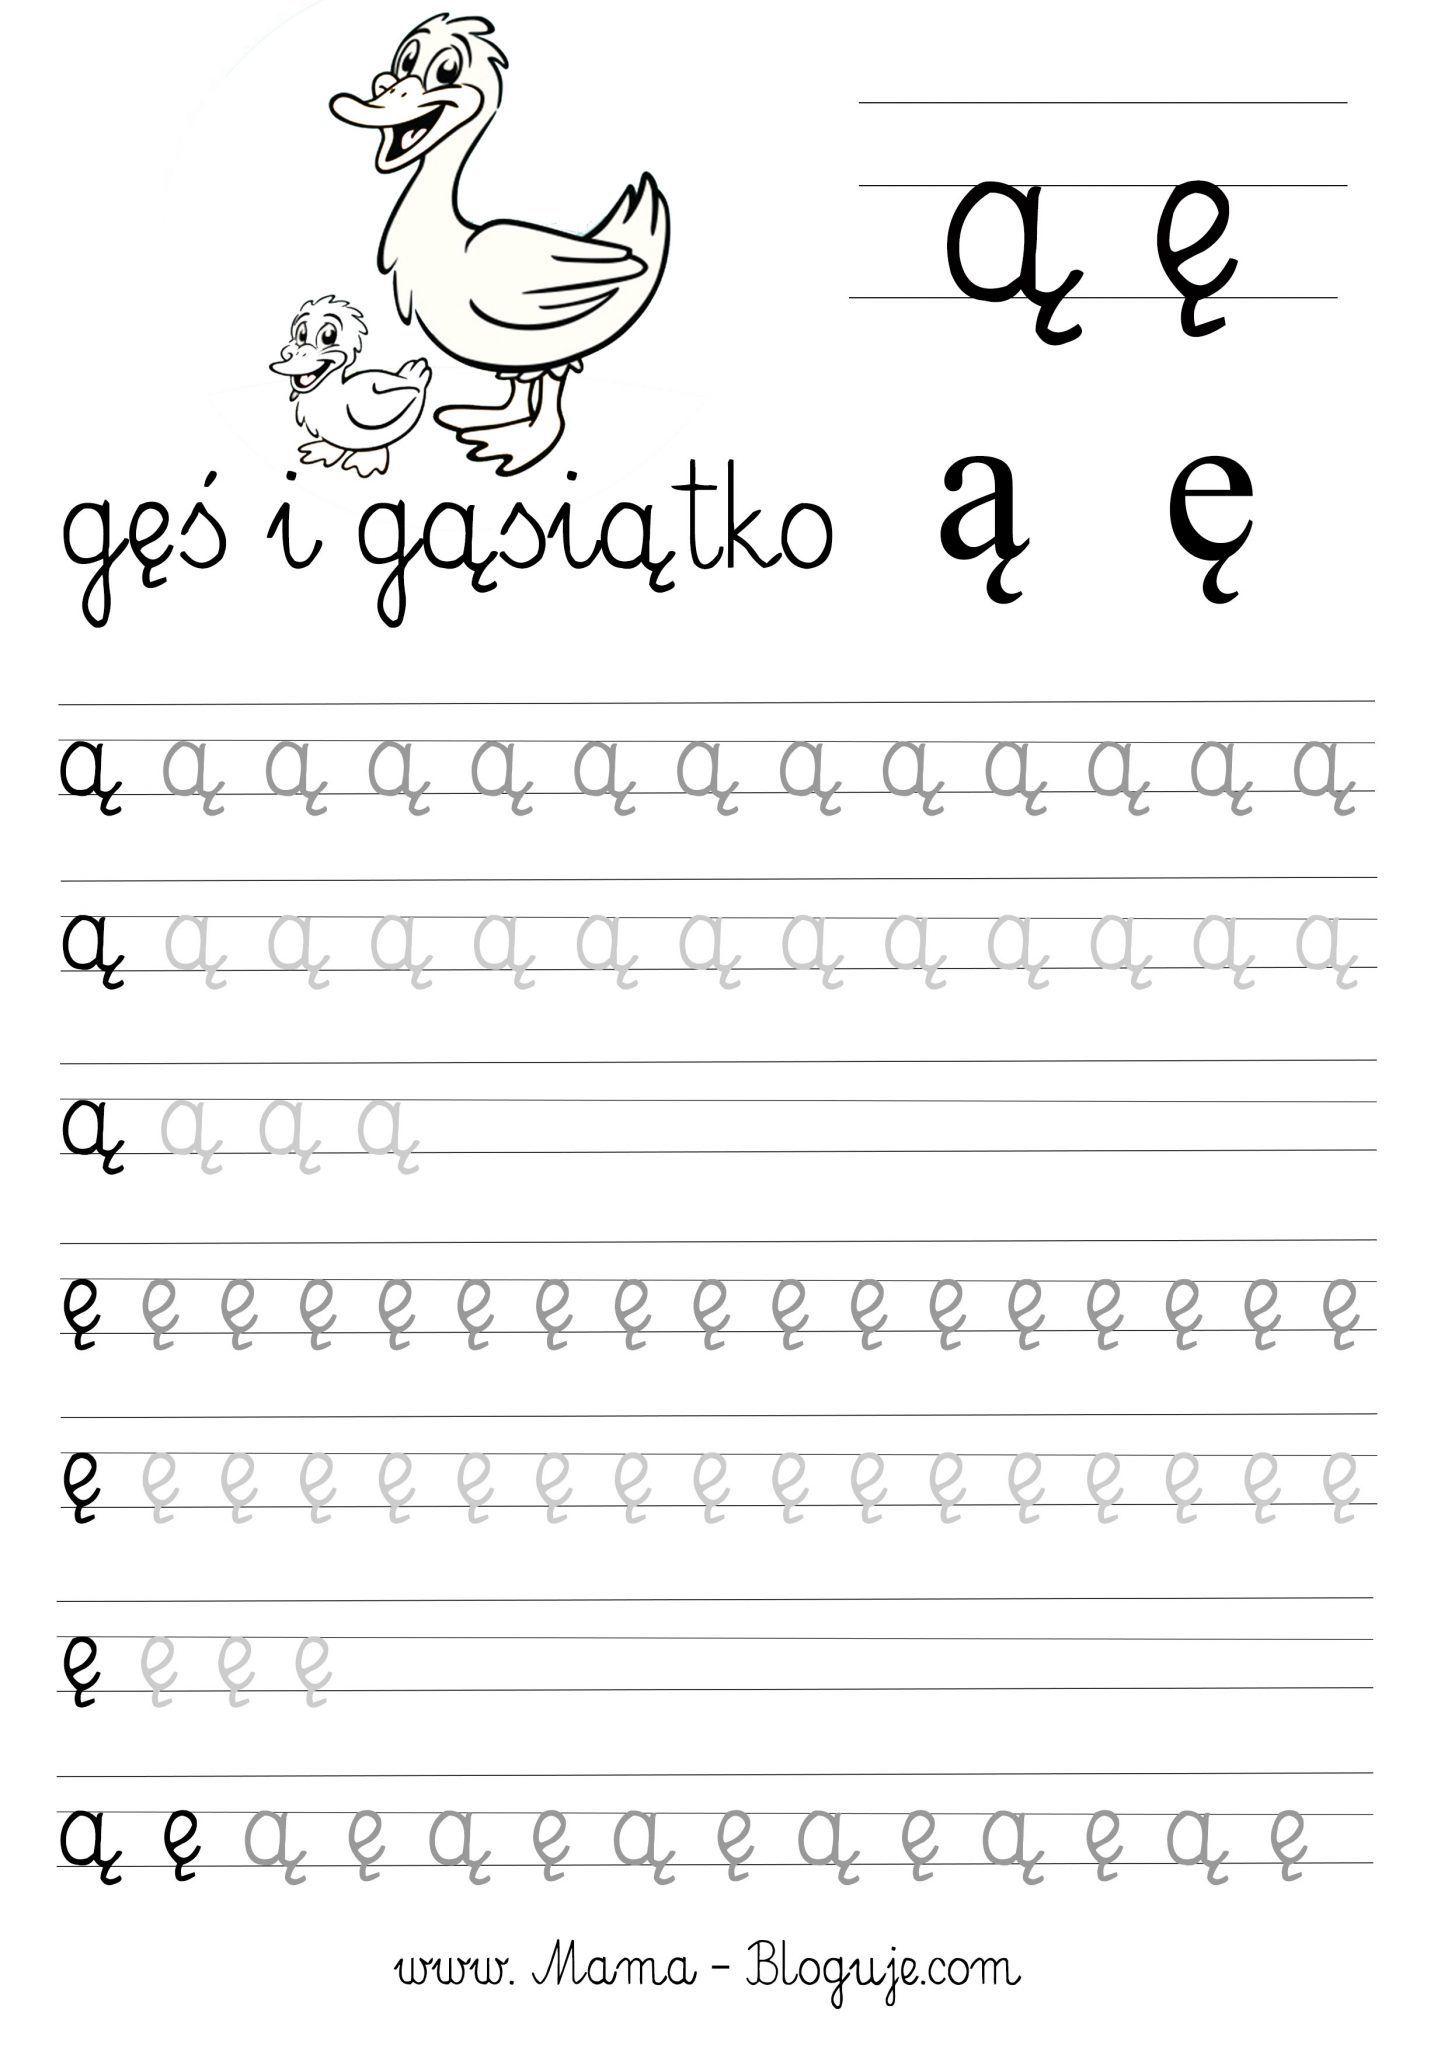 Szablony Do Nauki Polskich Literek Karty Pracy Przedszkolaka Mama Bloguje Handwritten Letters Montessori Materials Toddler Learning